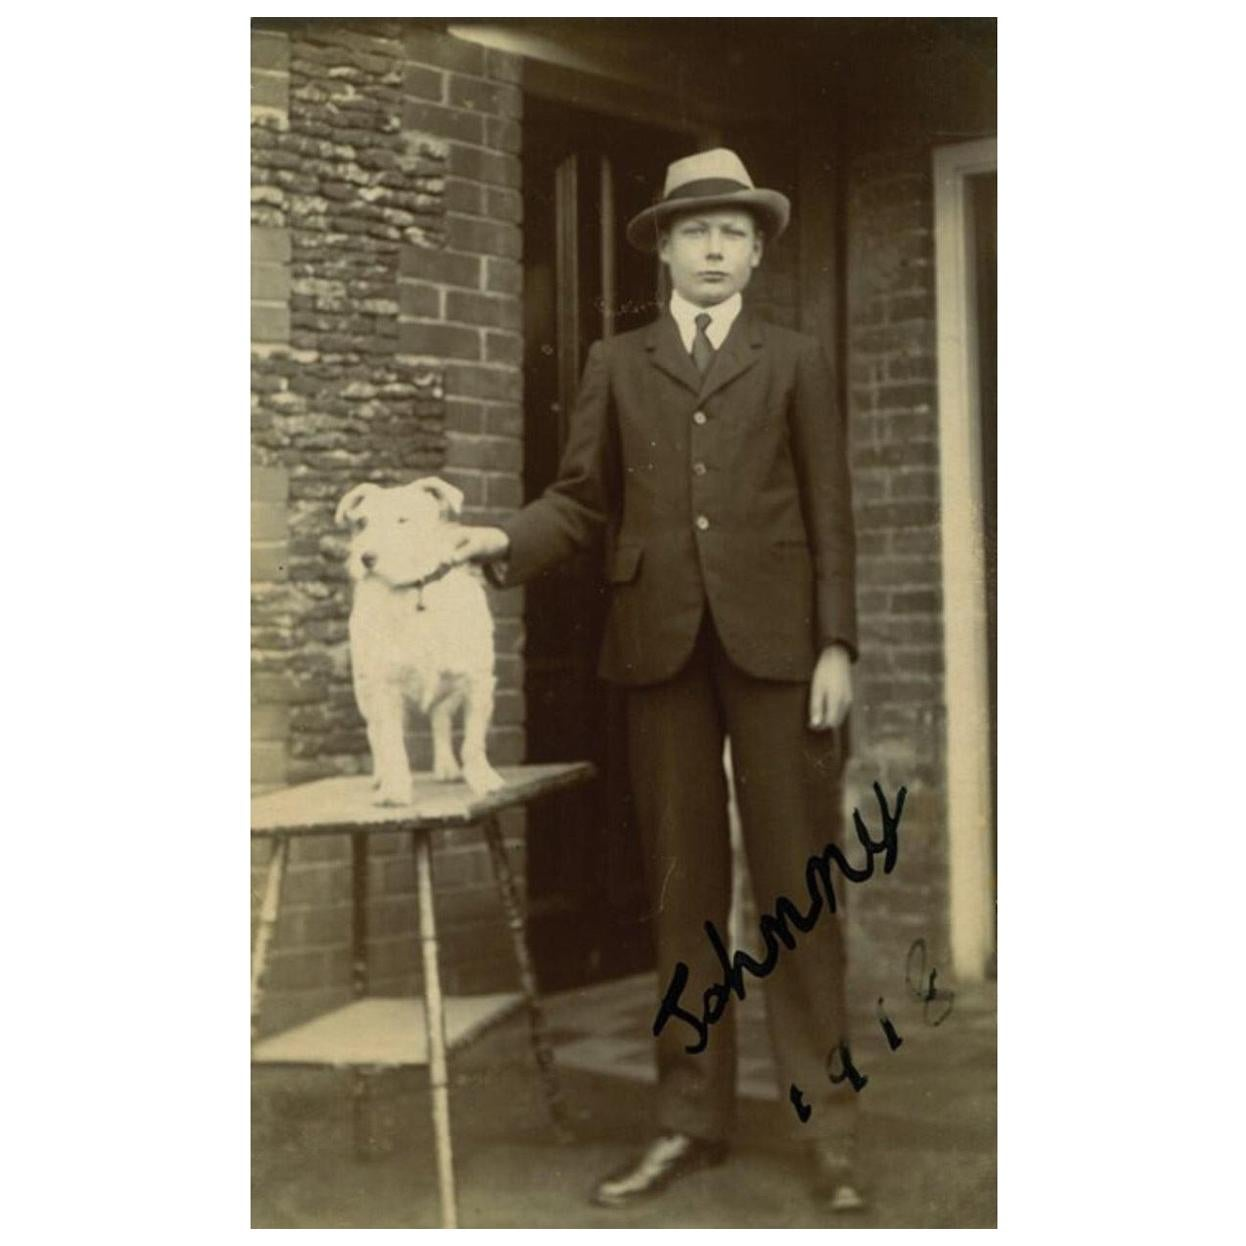 Prince John Vintage 1918 Signed Black and White Photograph